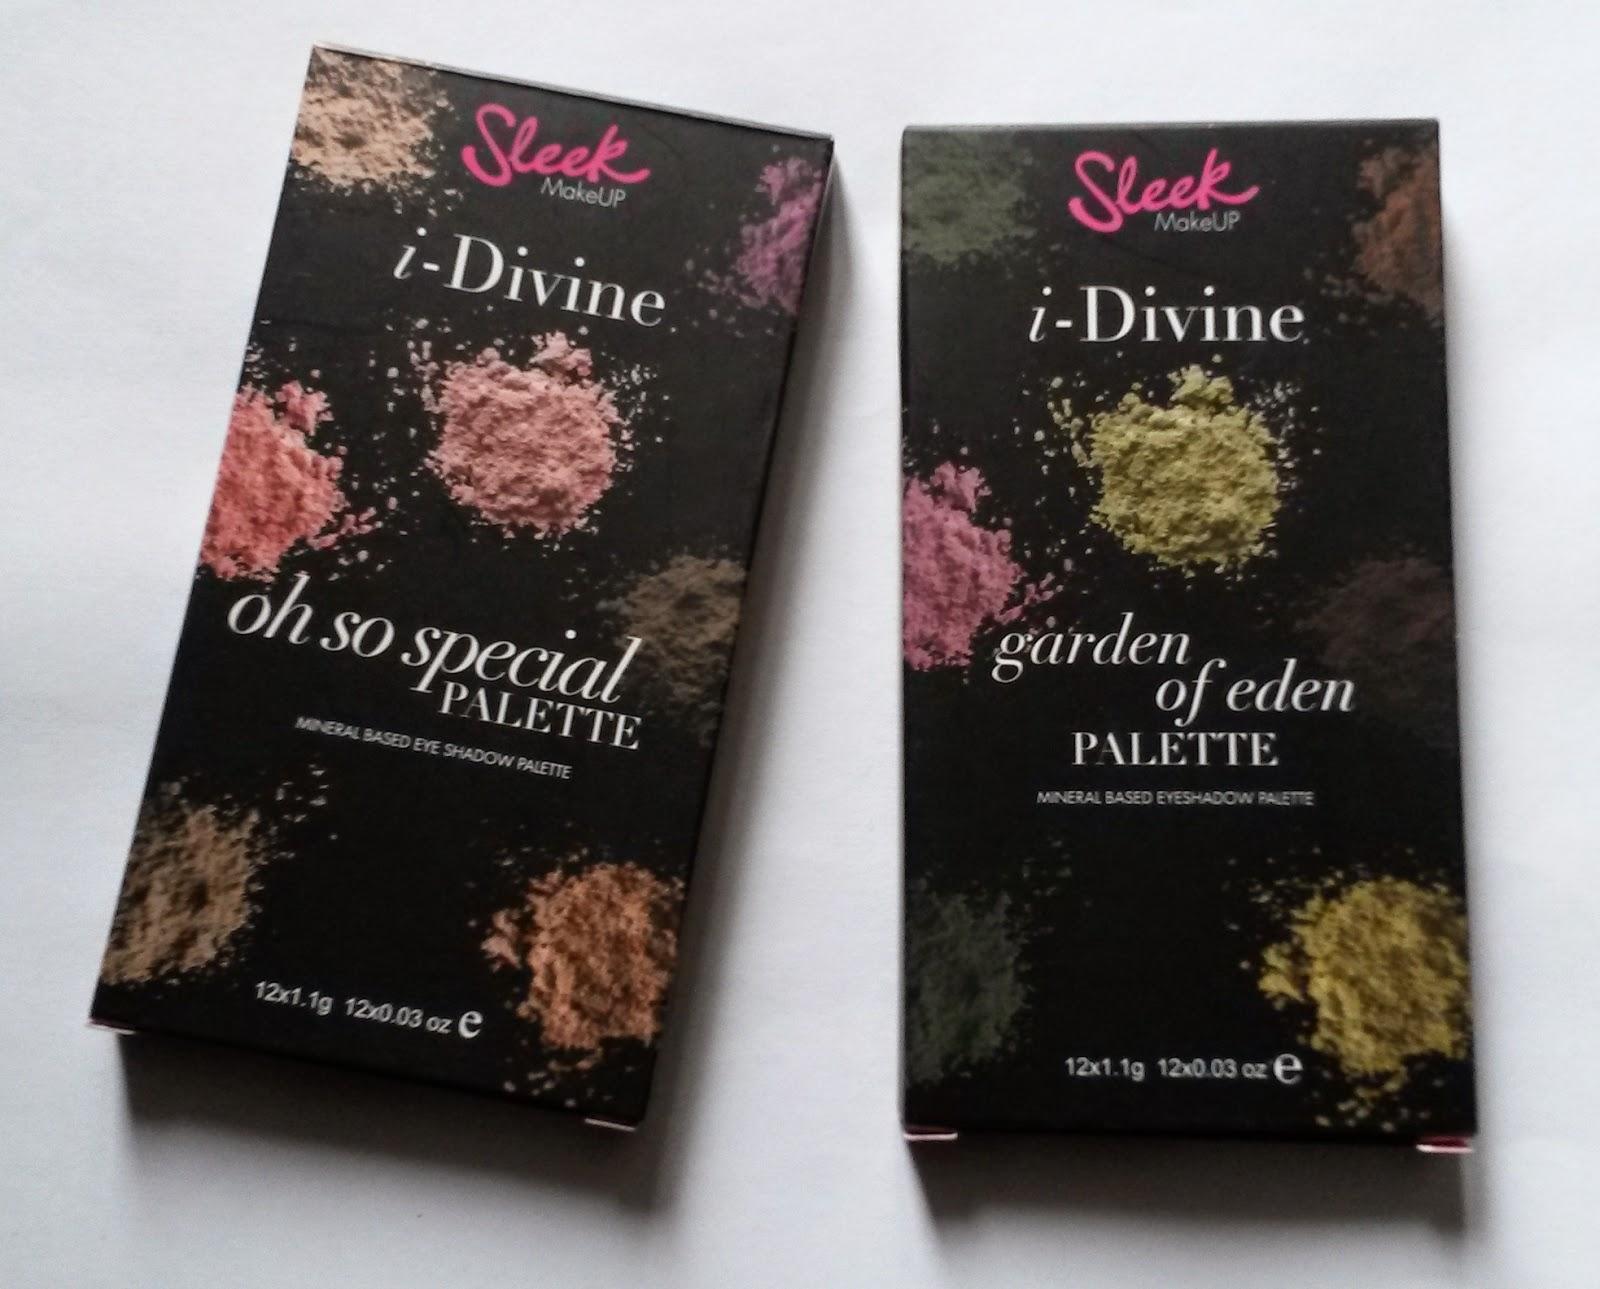 les palettes I-Divine Sleek